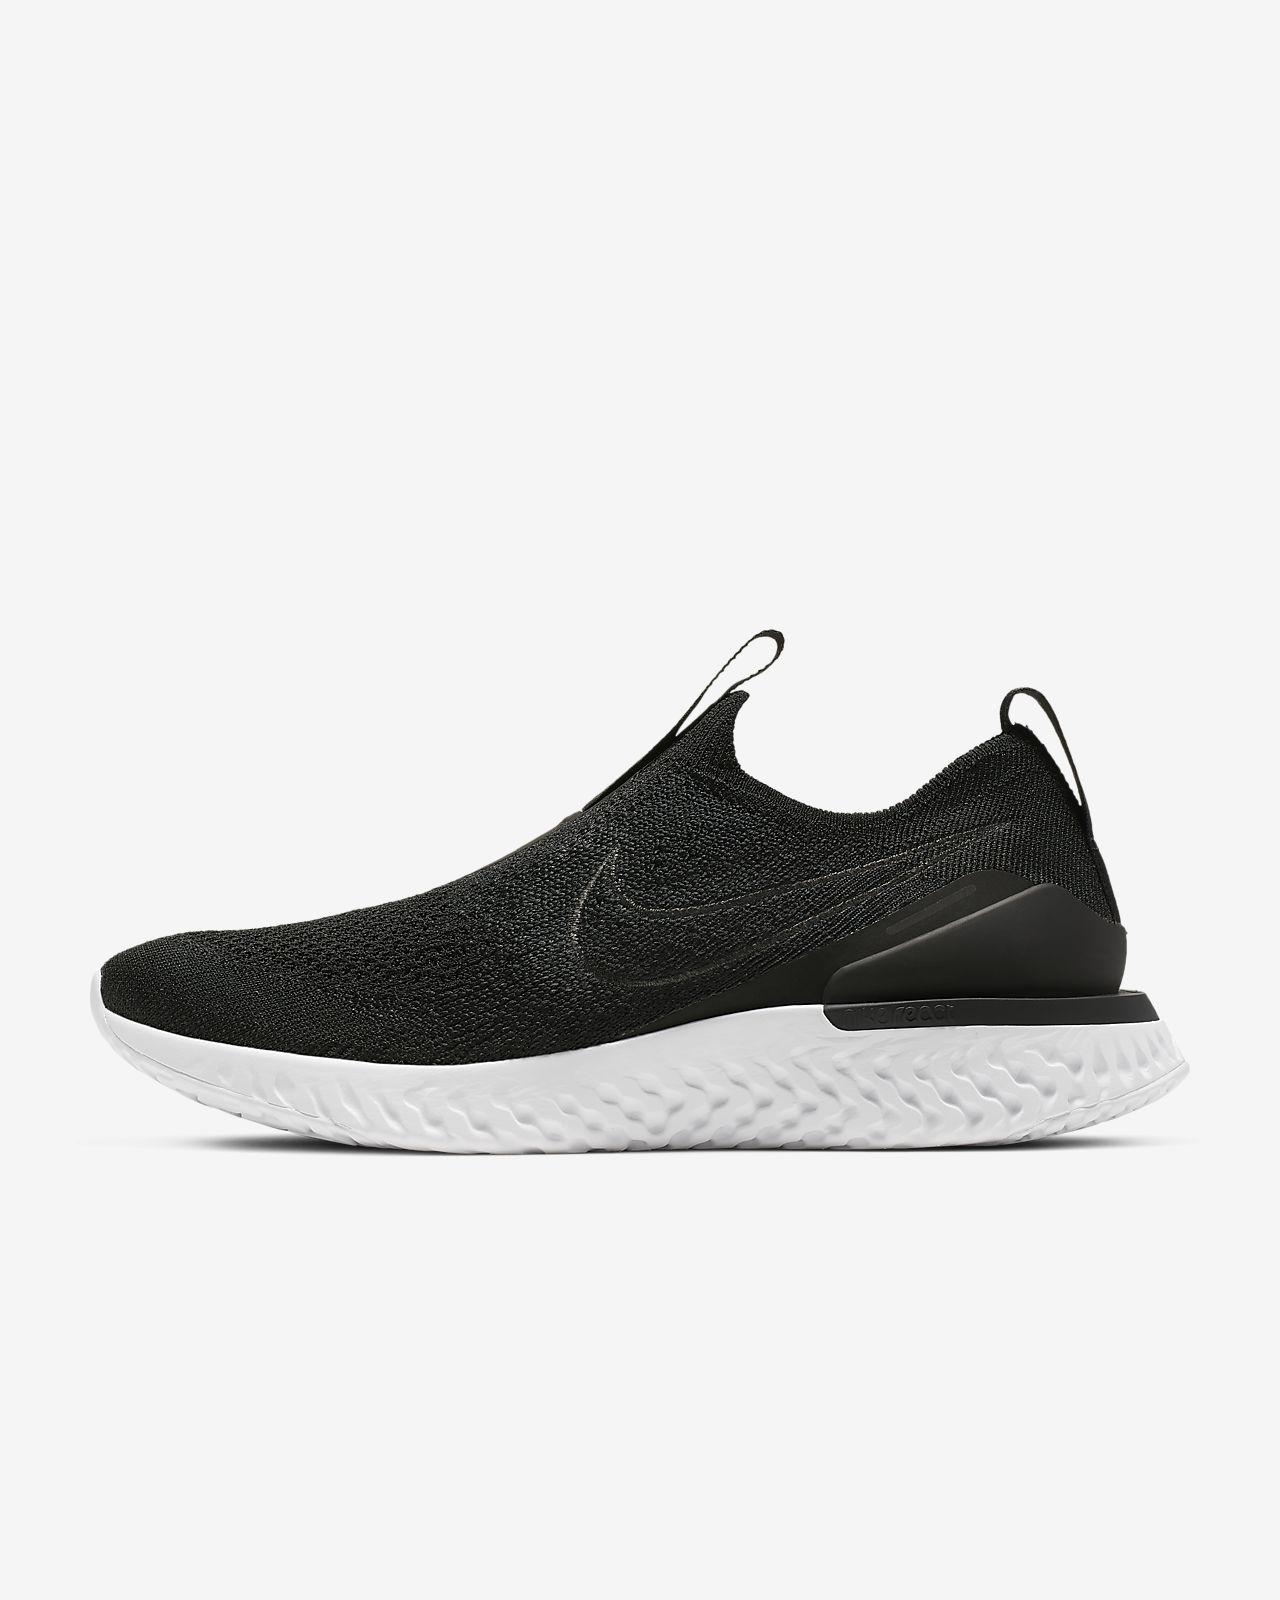 Dámská běžecká bota Nike Epic Phantom React Flyknit